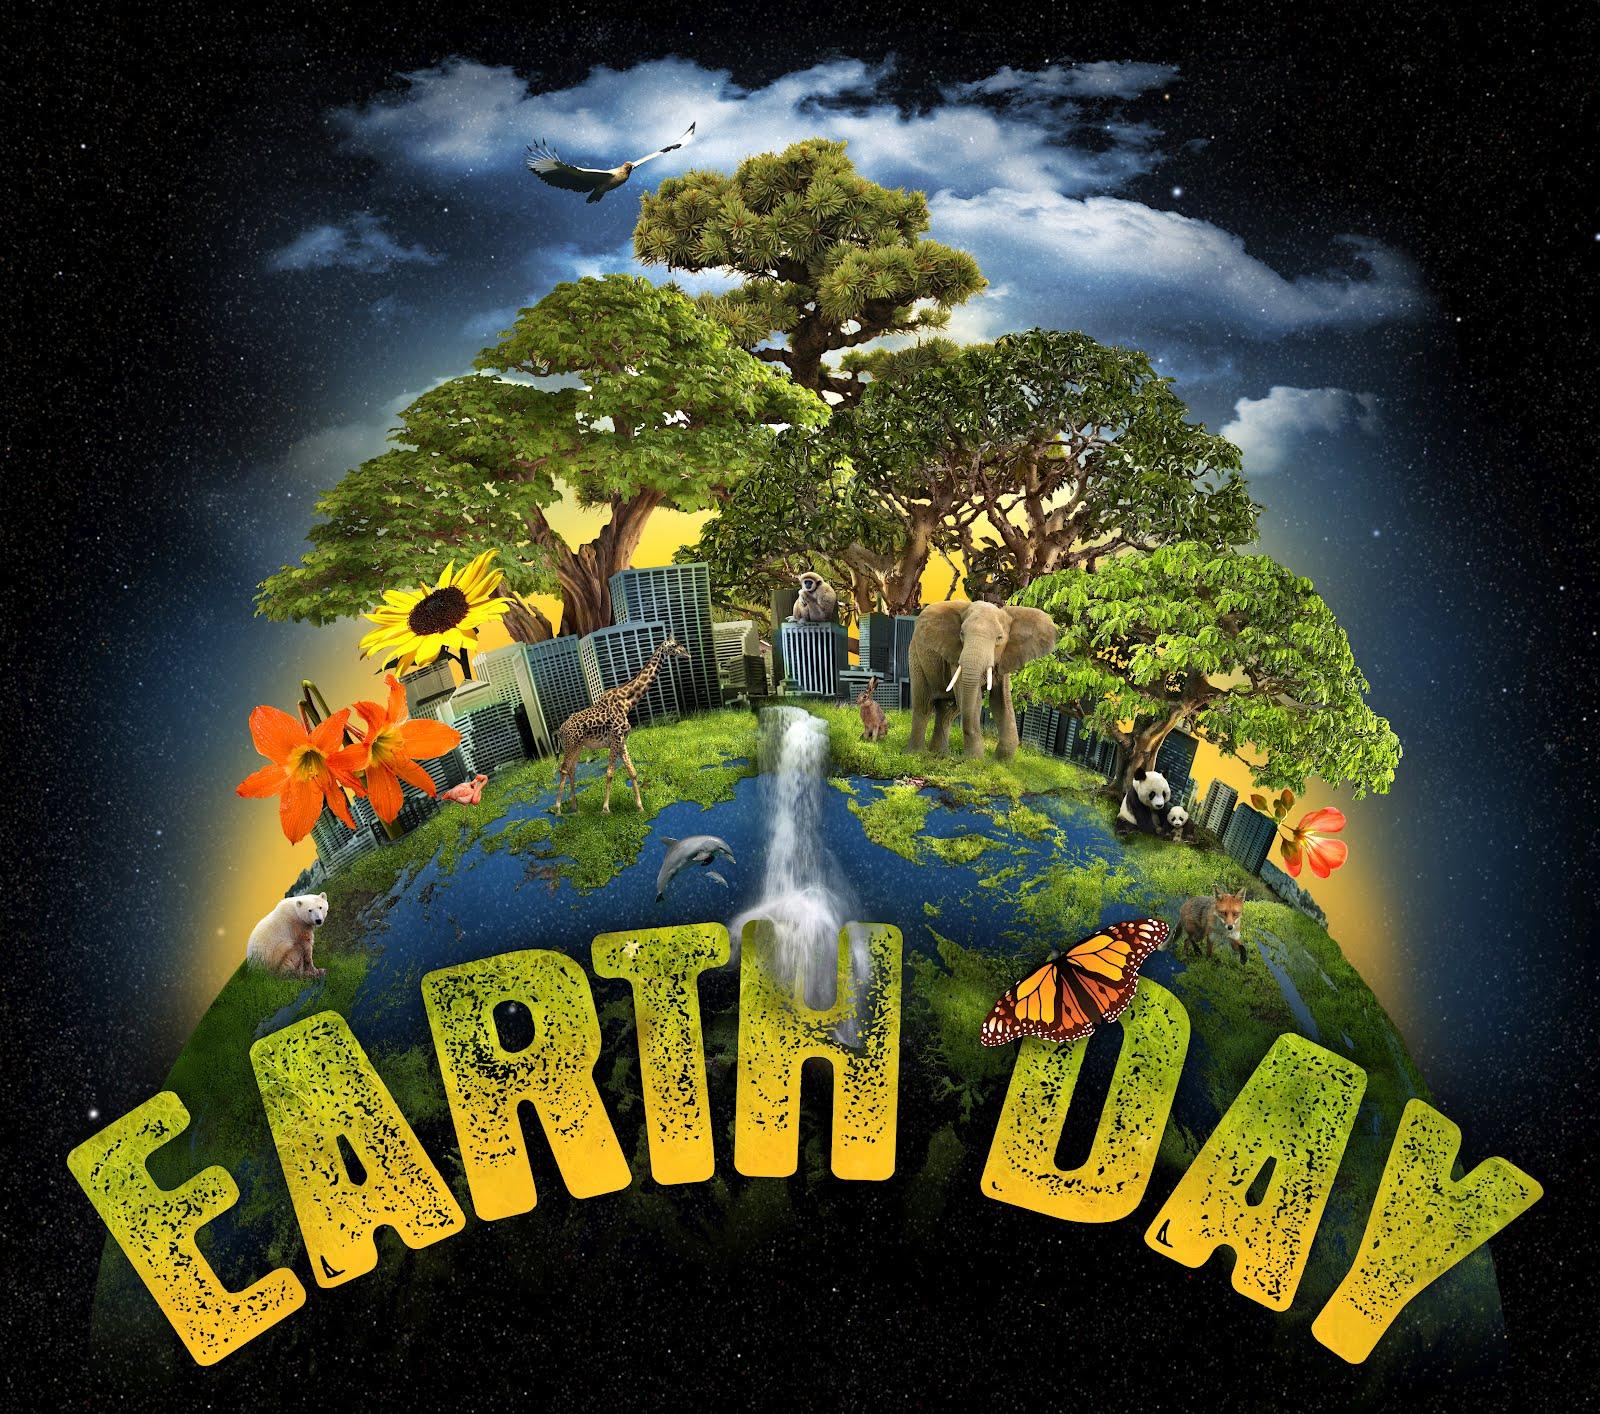 Earth_Day_2012_2a.jpg